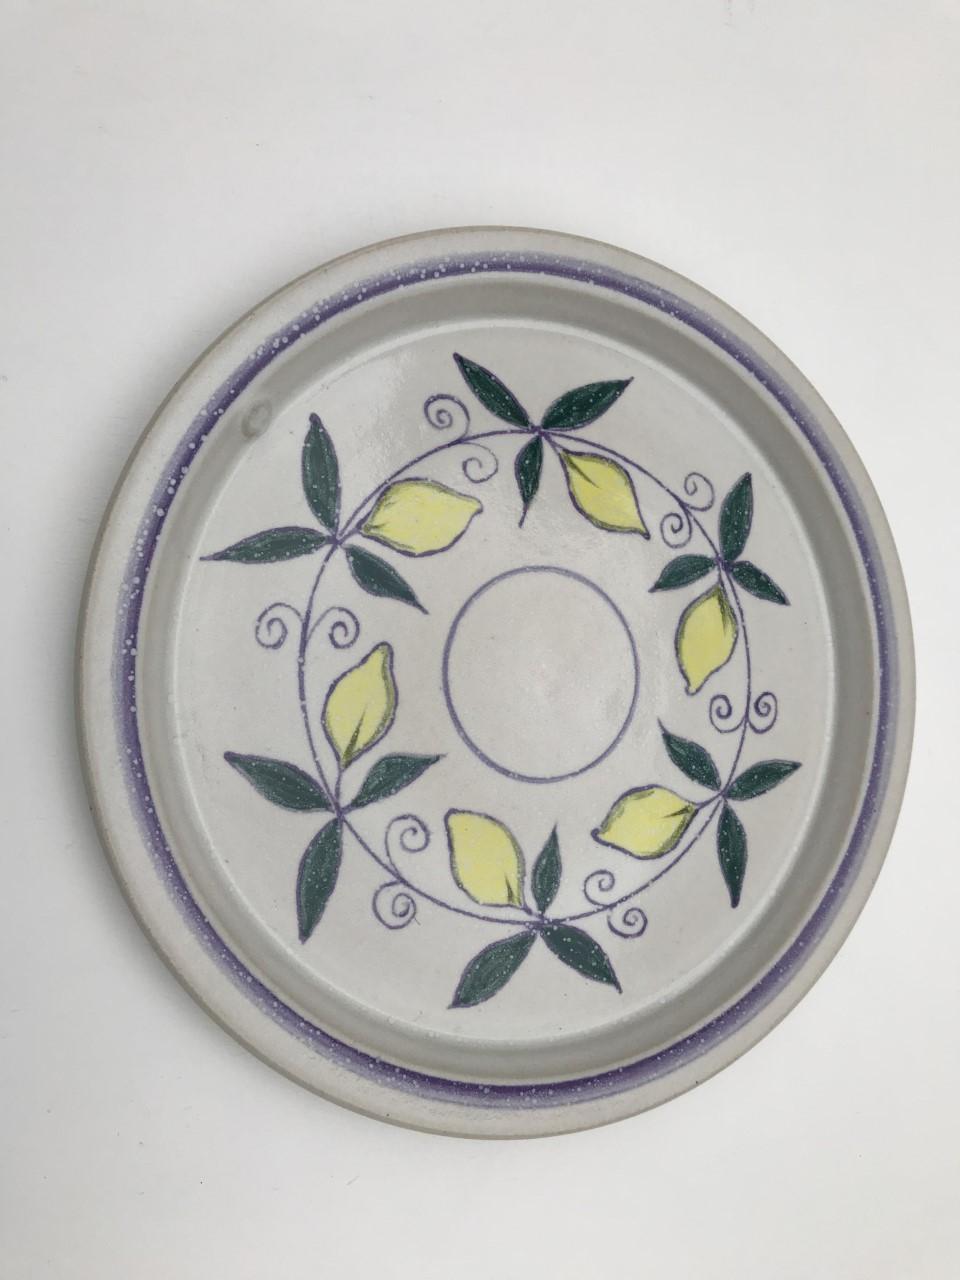 Mike Braisher j.pg3 Ceramic tray